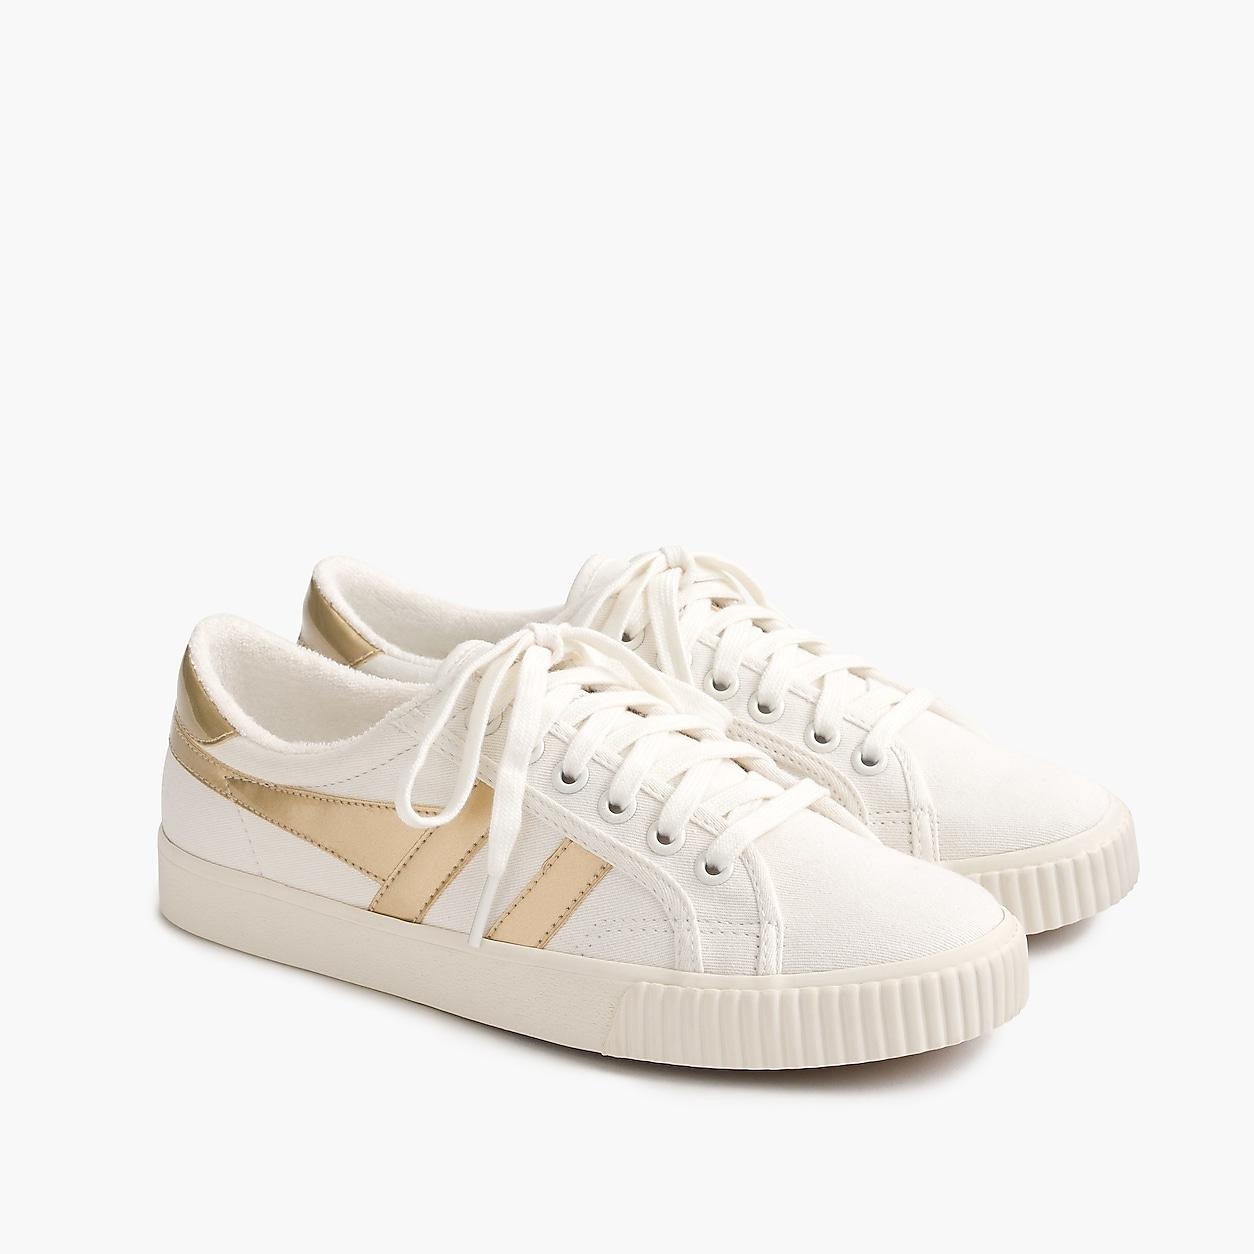 Gola For J.Crew Mark Cox Tennis Sneakers